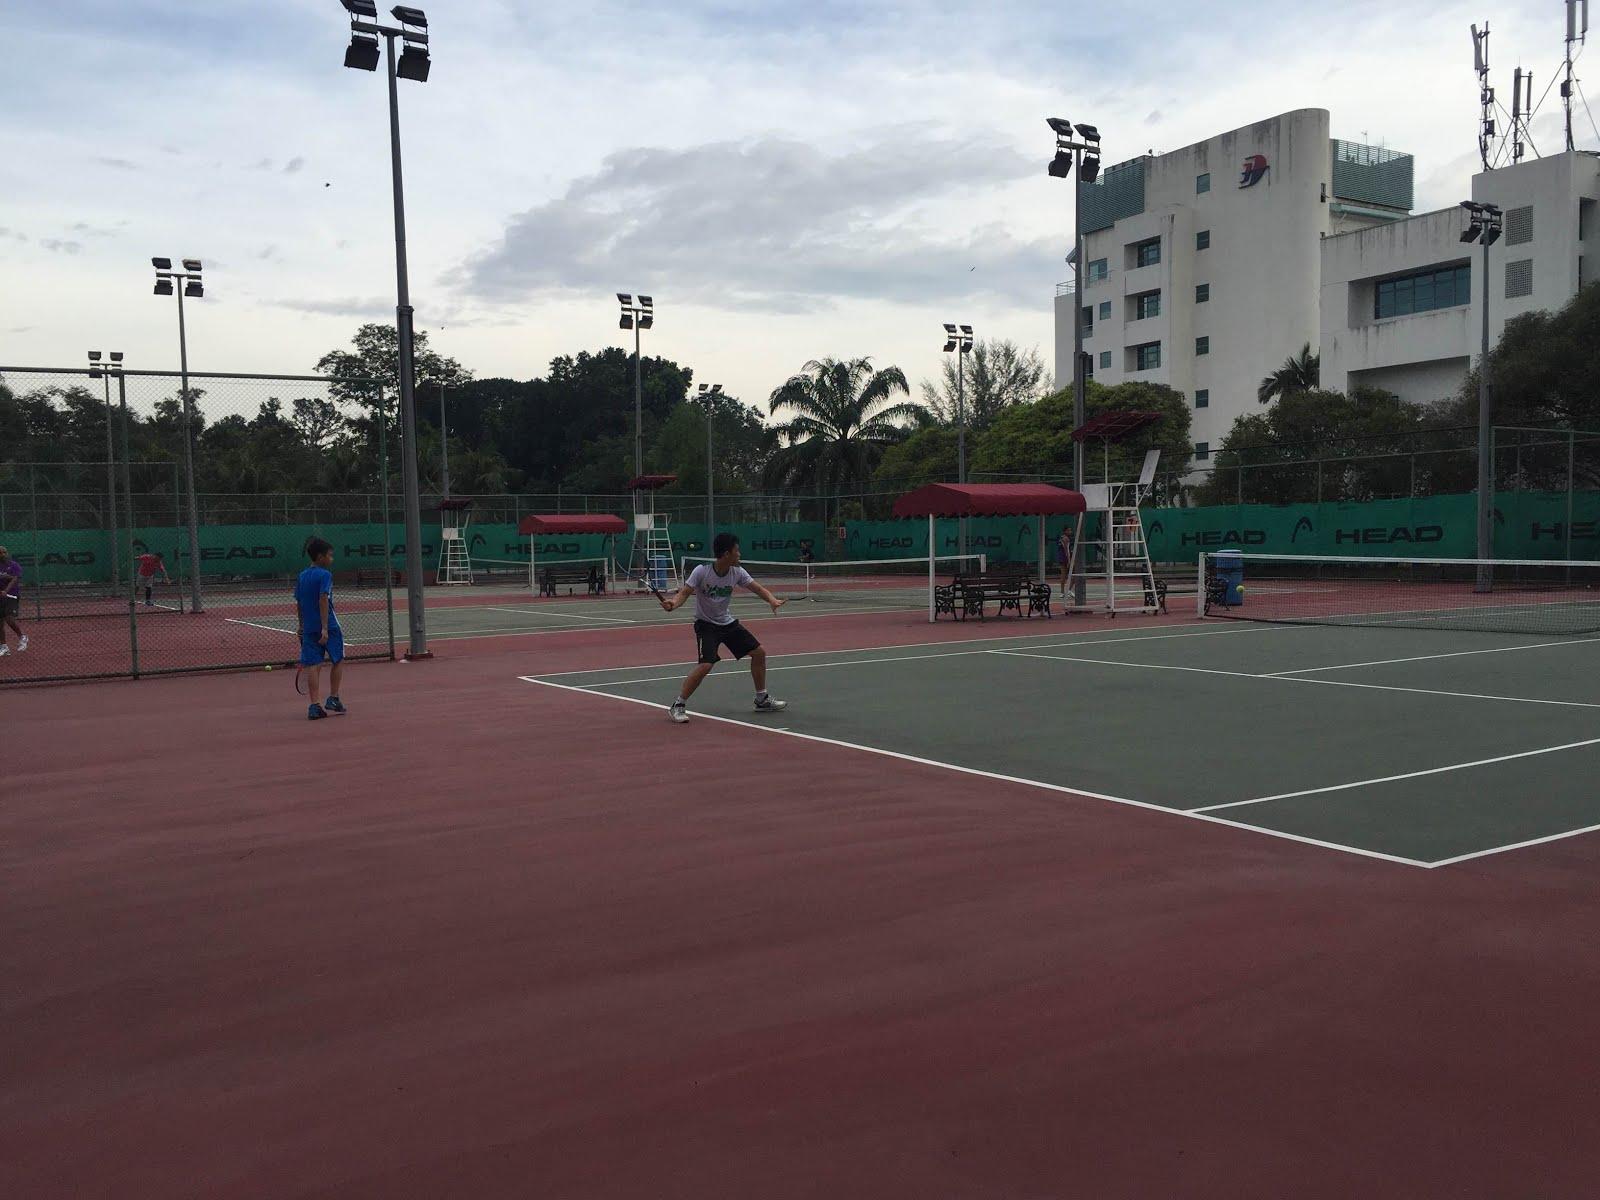 Pusat Tenis Jalan Duta